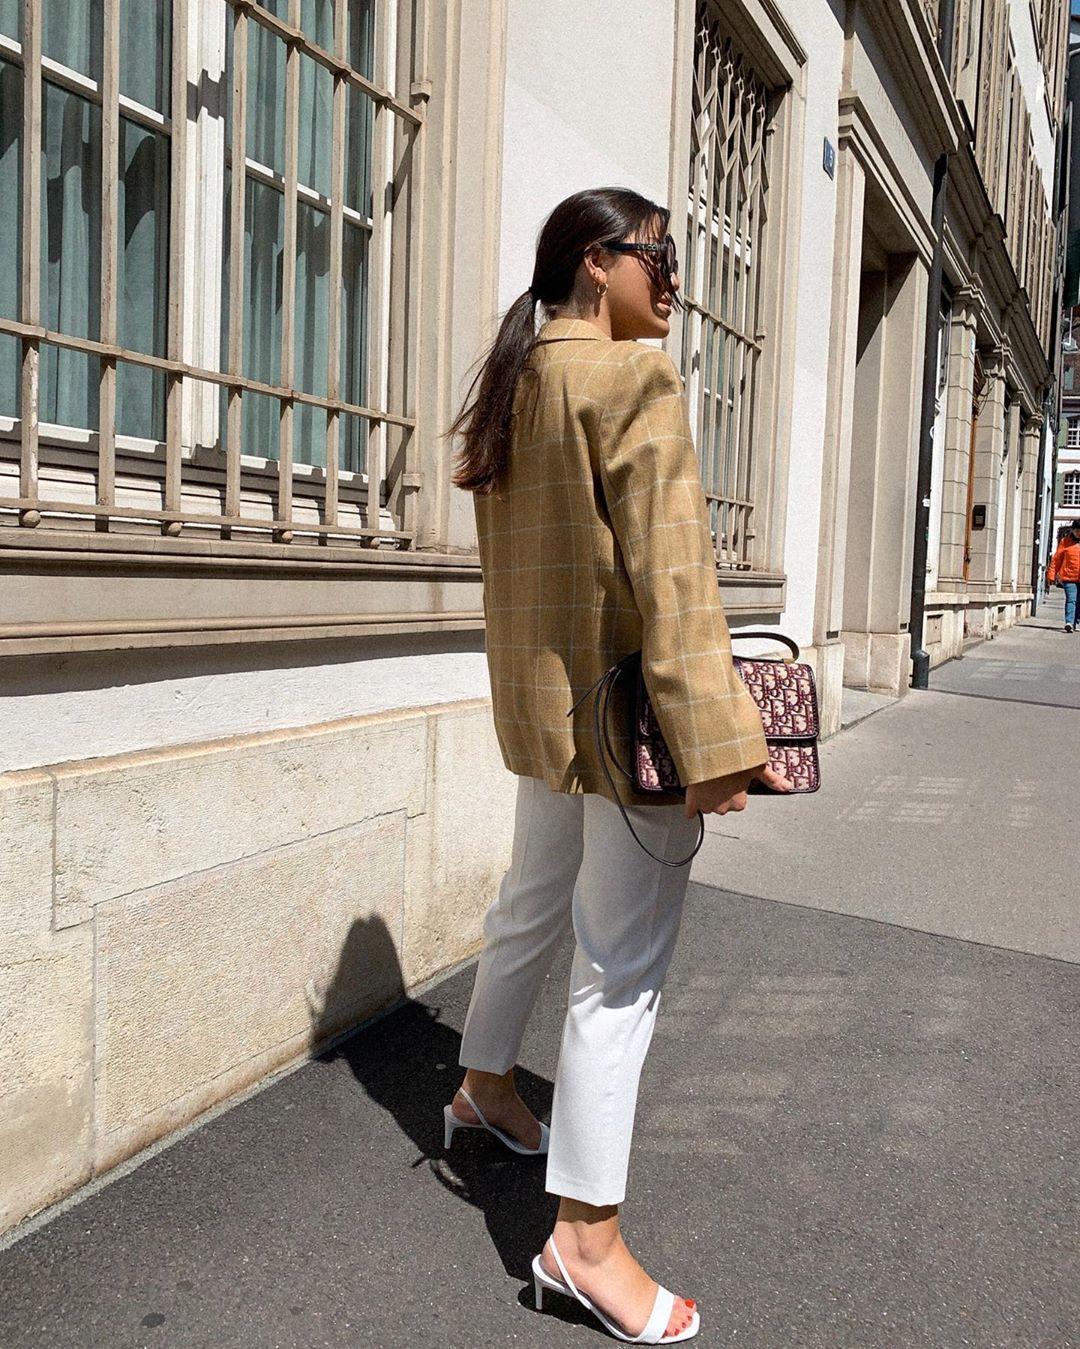 leather sandals with heels and animal print de zara sur entre_dois